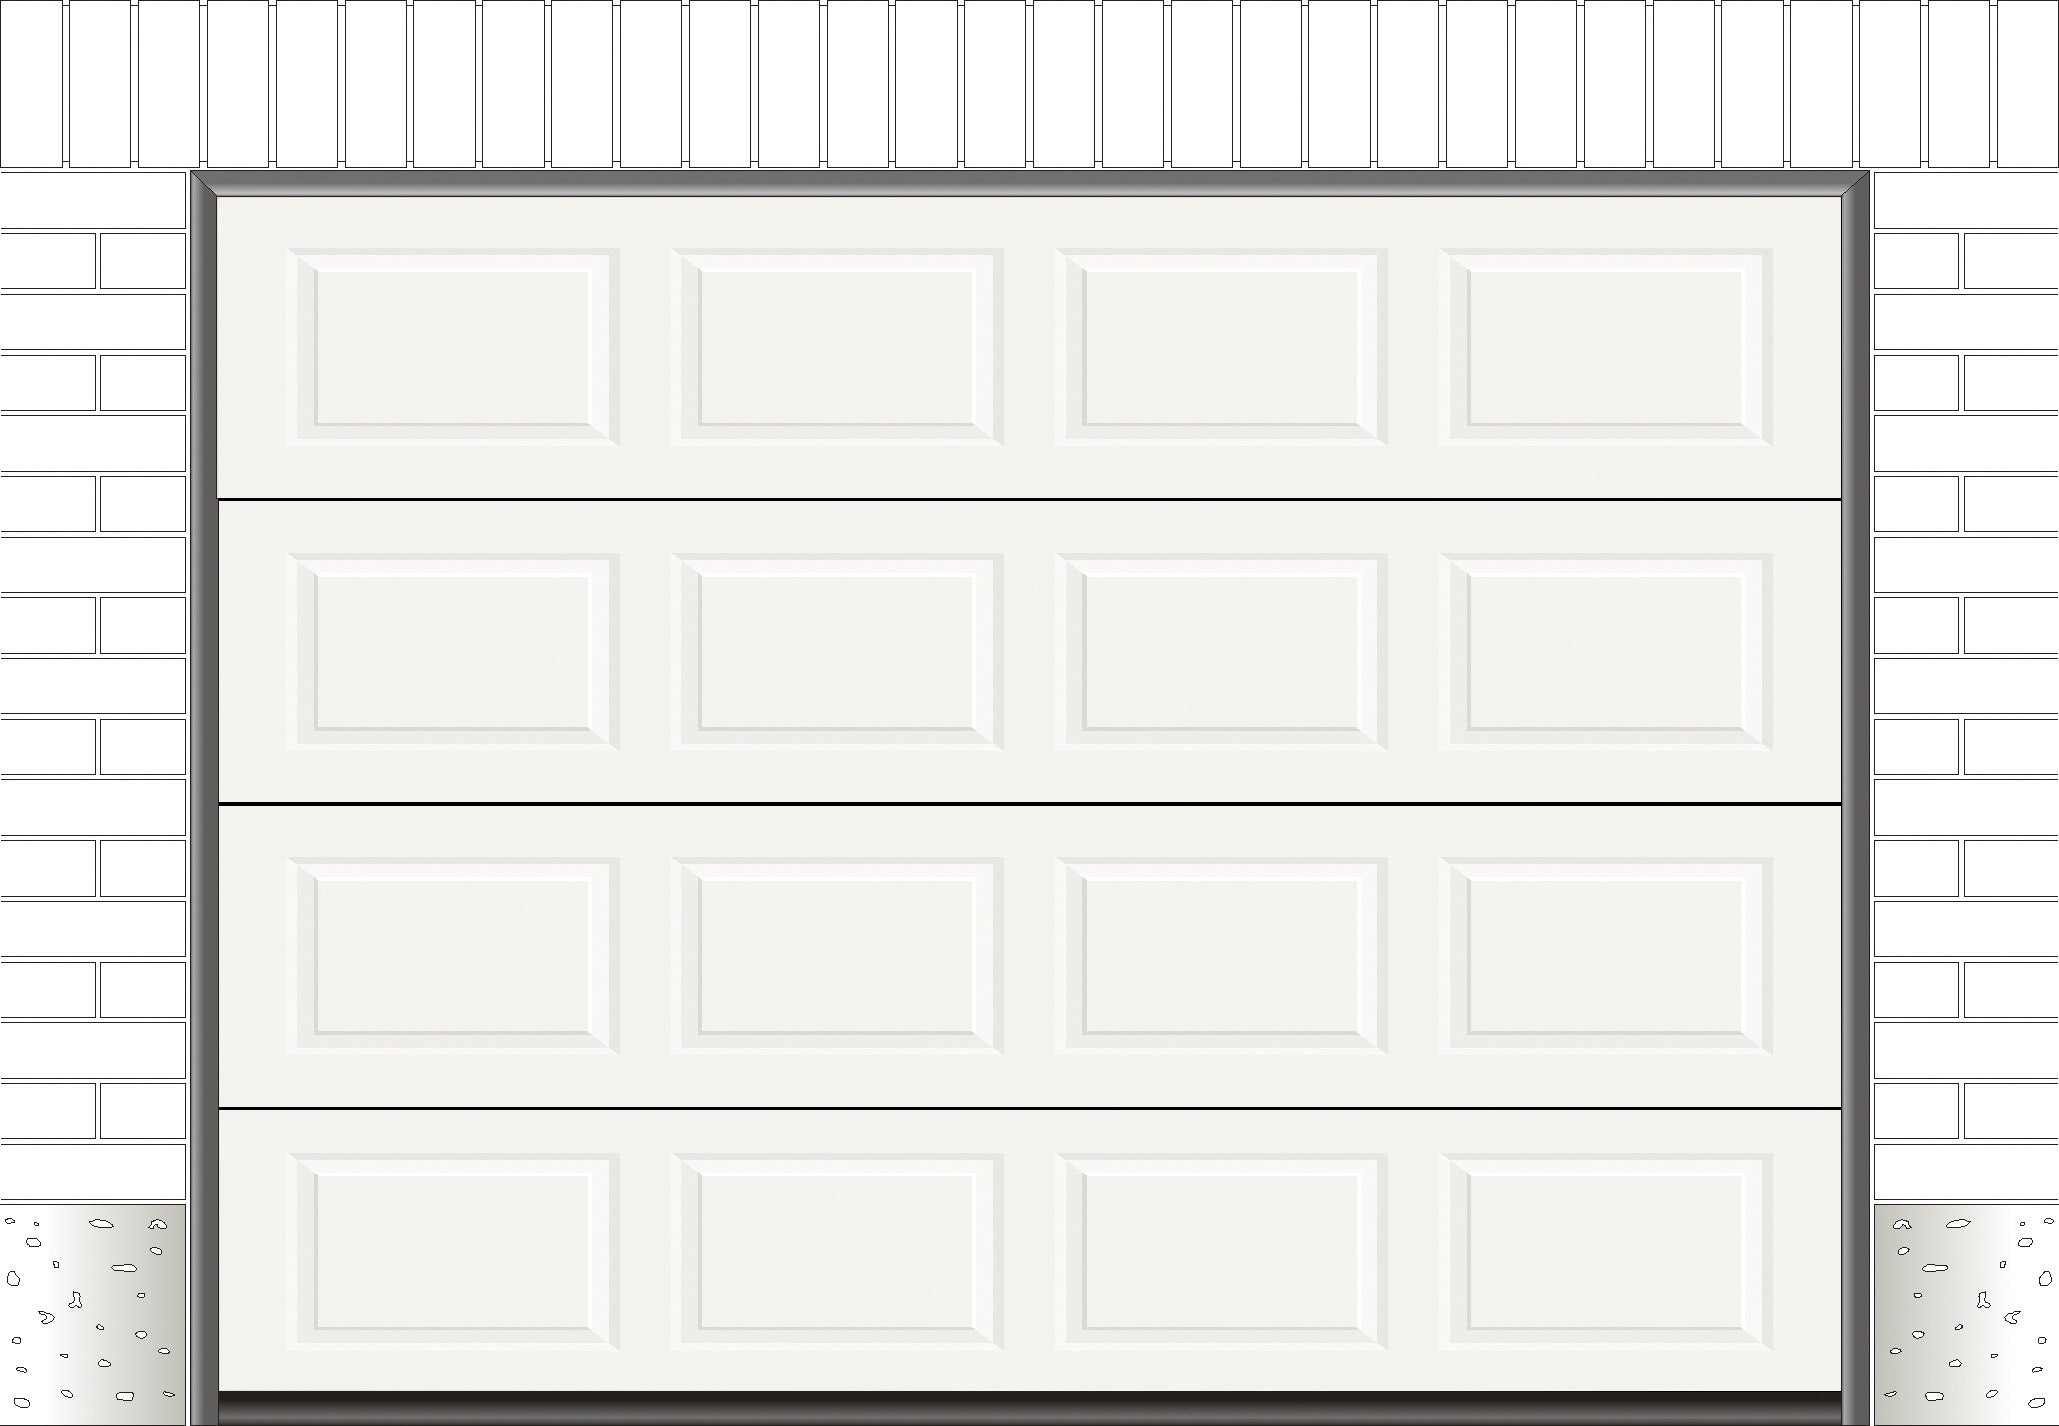 Garageport Garageportexperten R30 Kassett Vit 2500x2000 mm Ink. Skenor